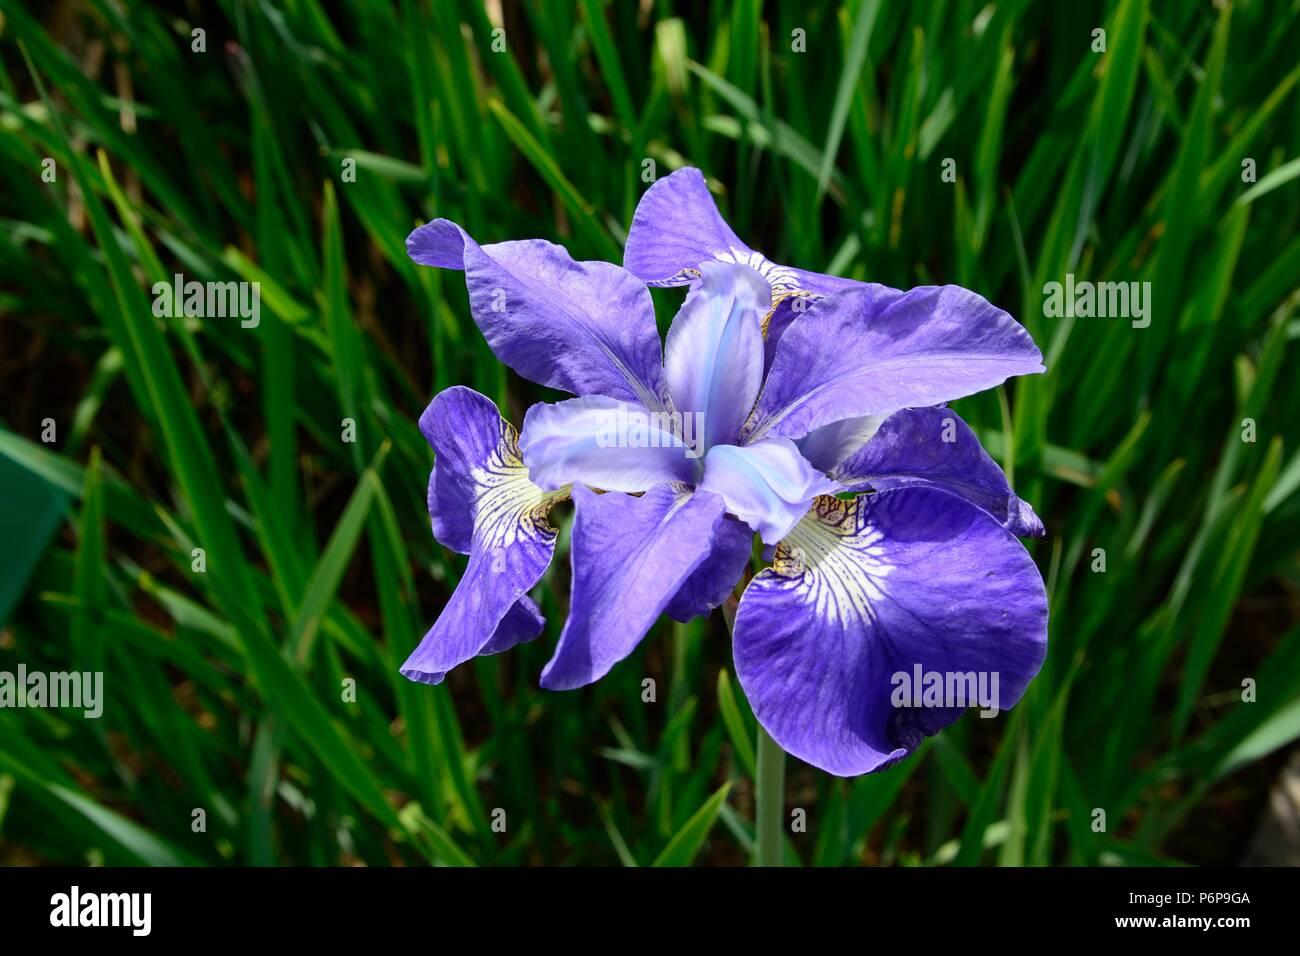 Iris sibirica silver edge flag iris siberian iris flower stock photo iris sibirica silver edge flag iris siberian iris flower izmirmasajfo